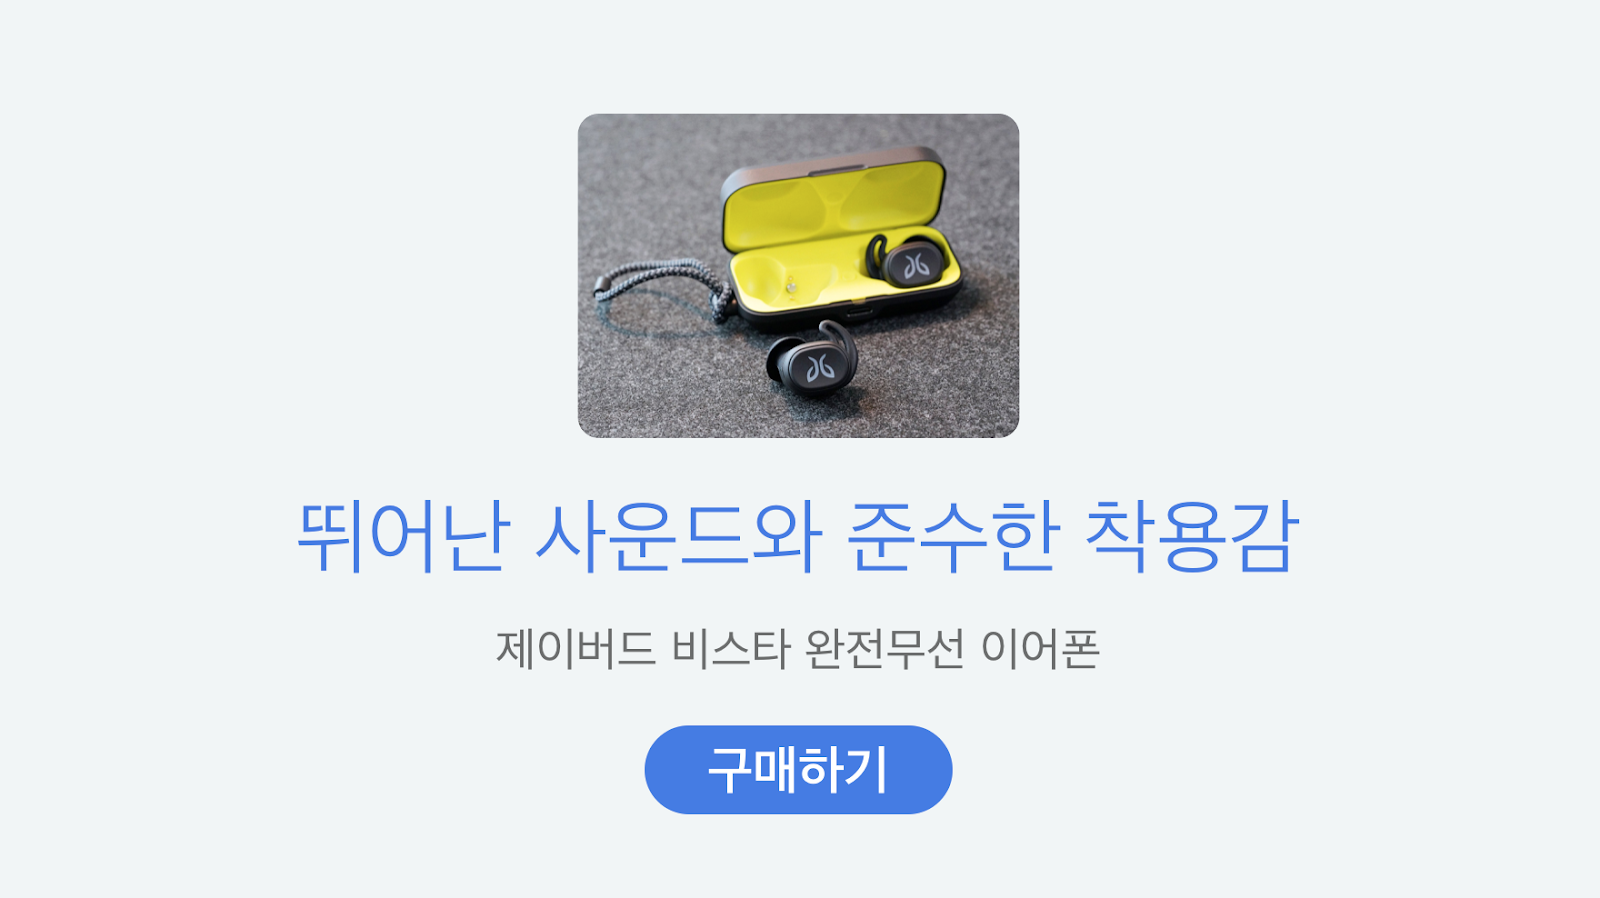 http://shopping.interpark.com/promotion/display.do?dispNo=021130092